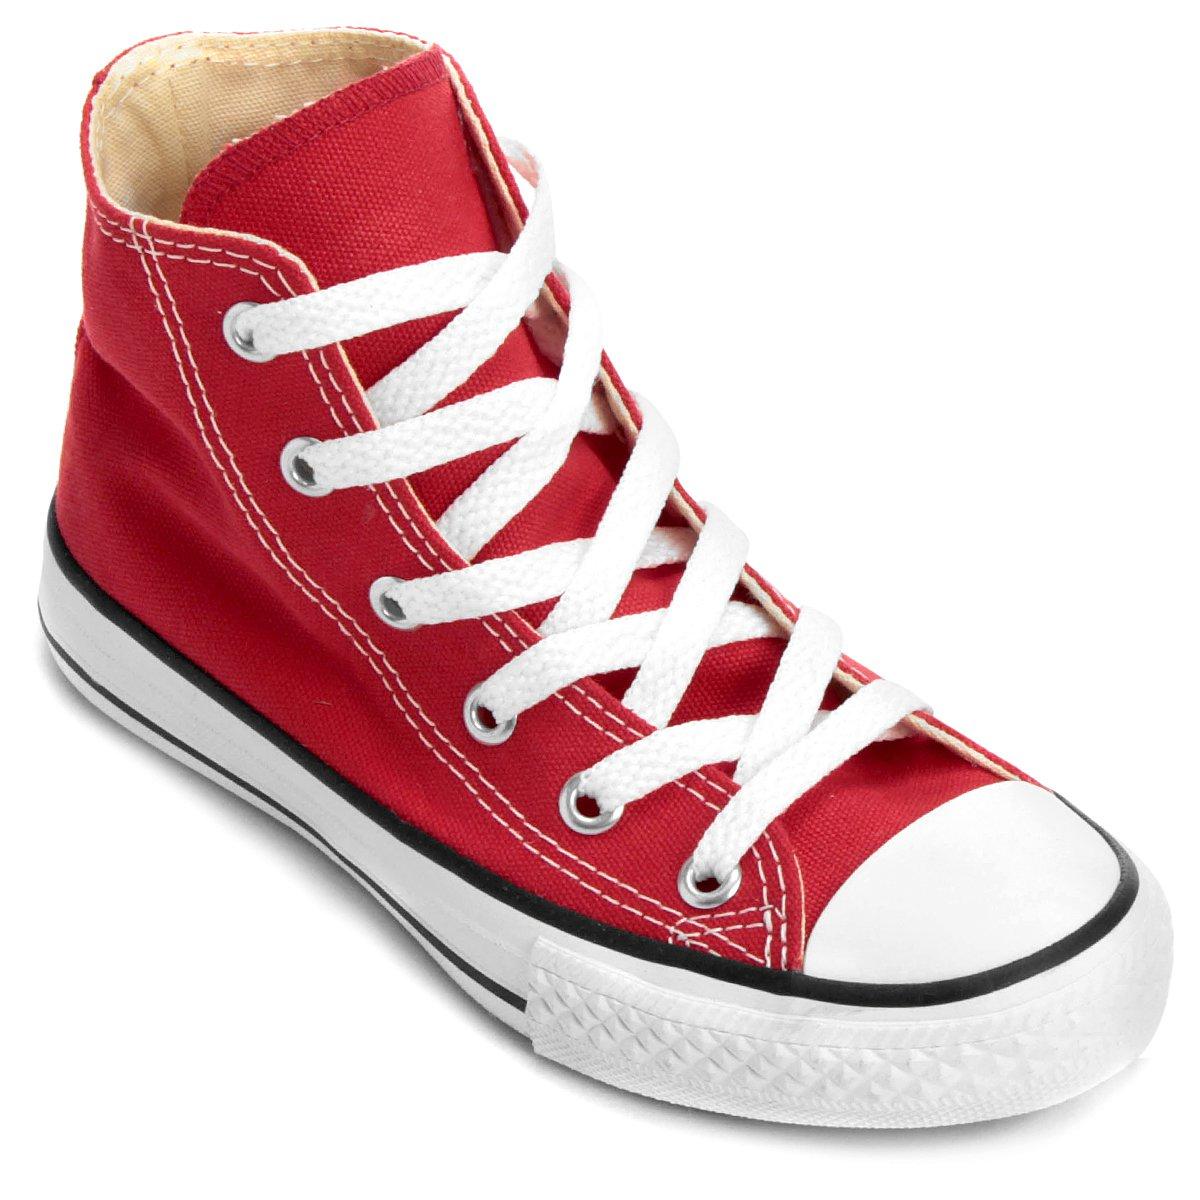 Tênis Infantil Converse All Star Chuck Taylor Hi Vermelho Preto Netshoes